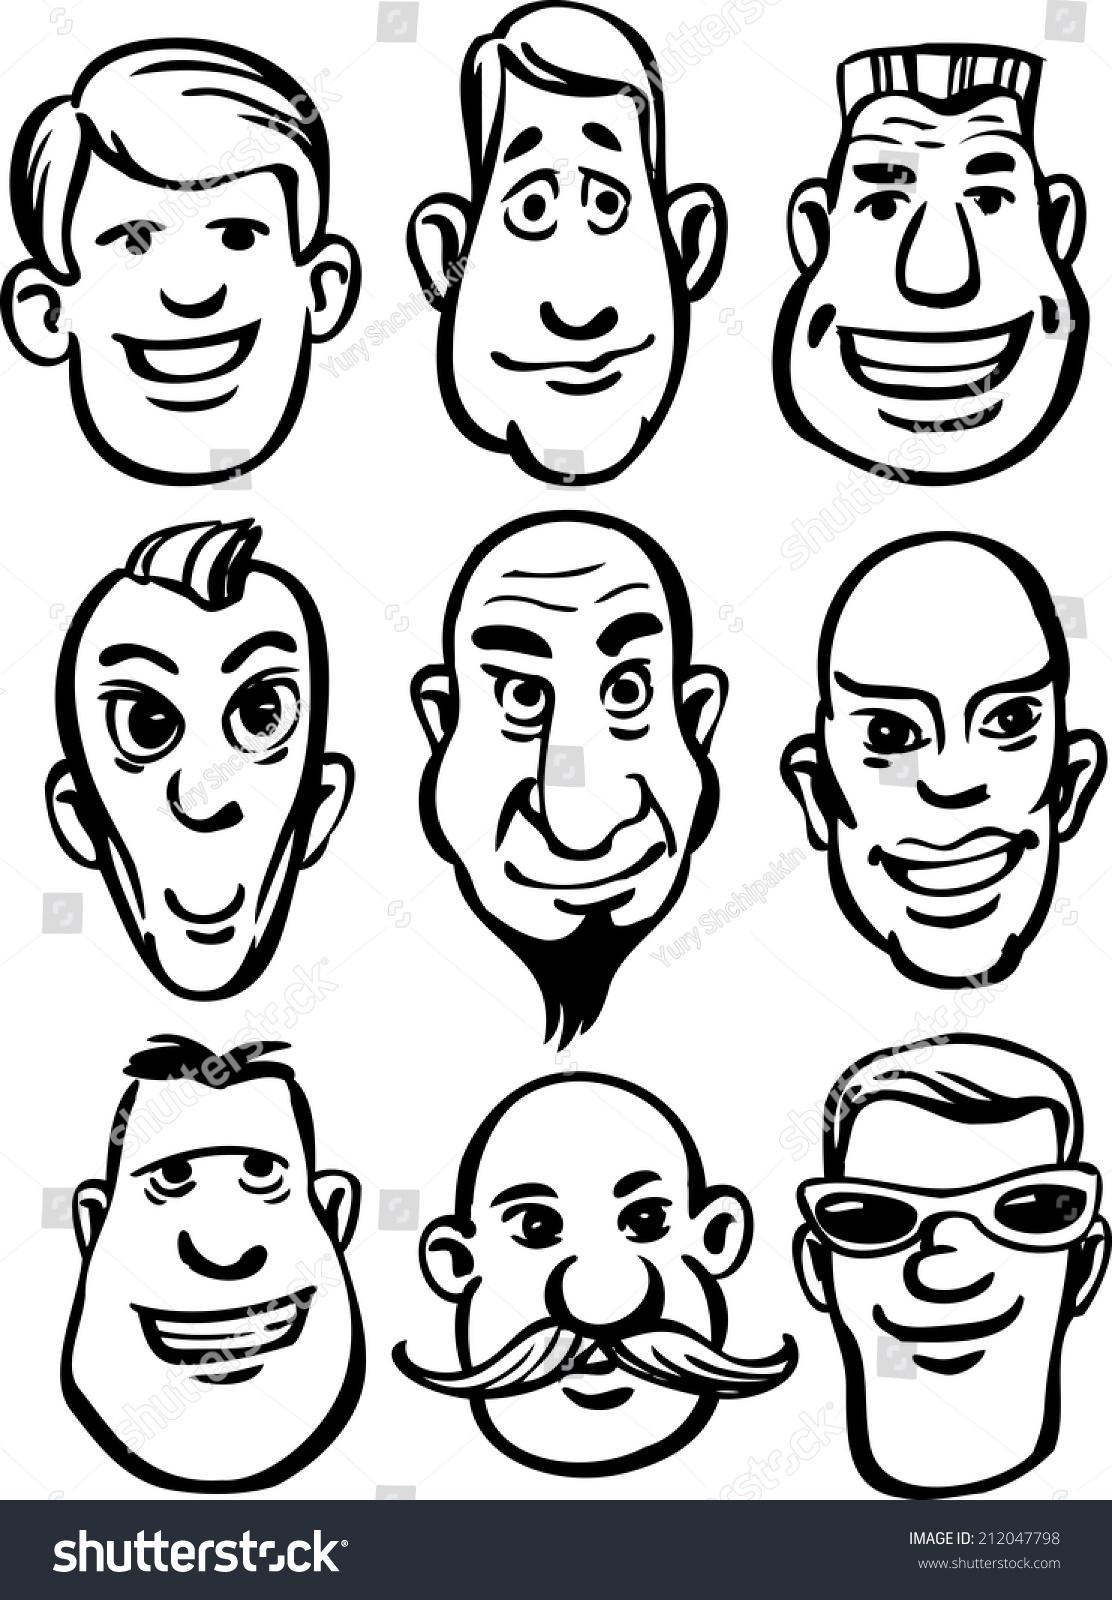 Whiteboard drawing cartoon men faces